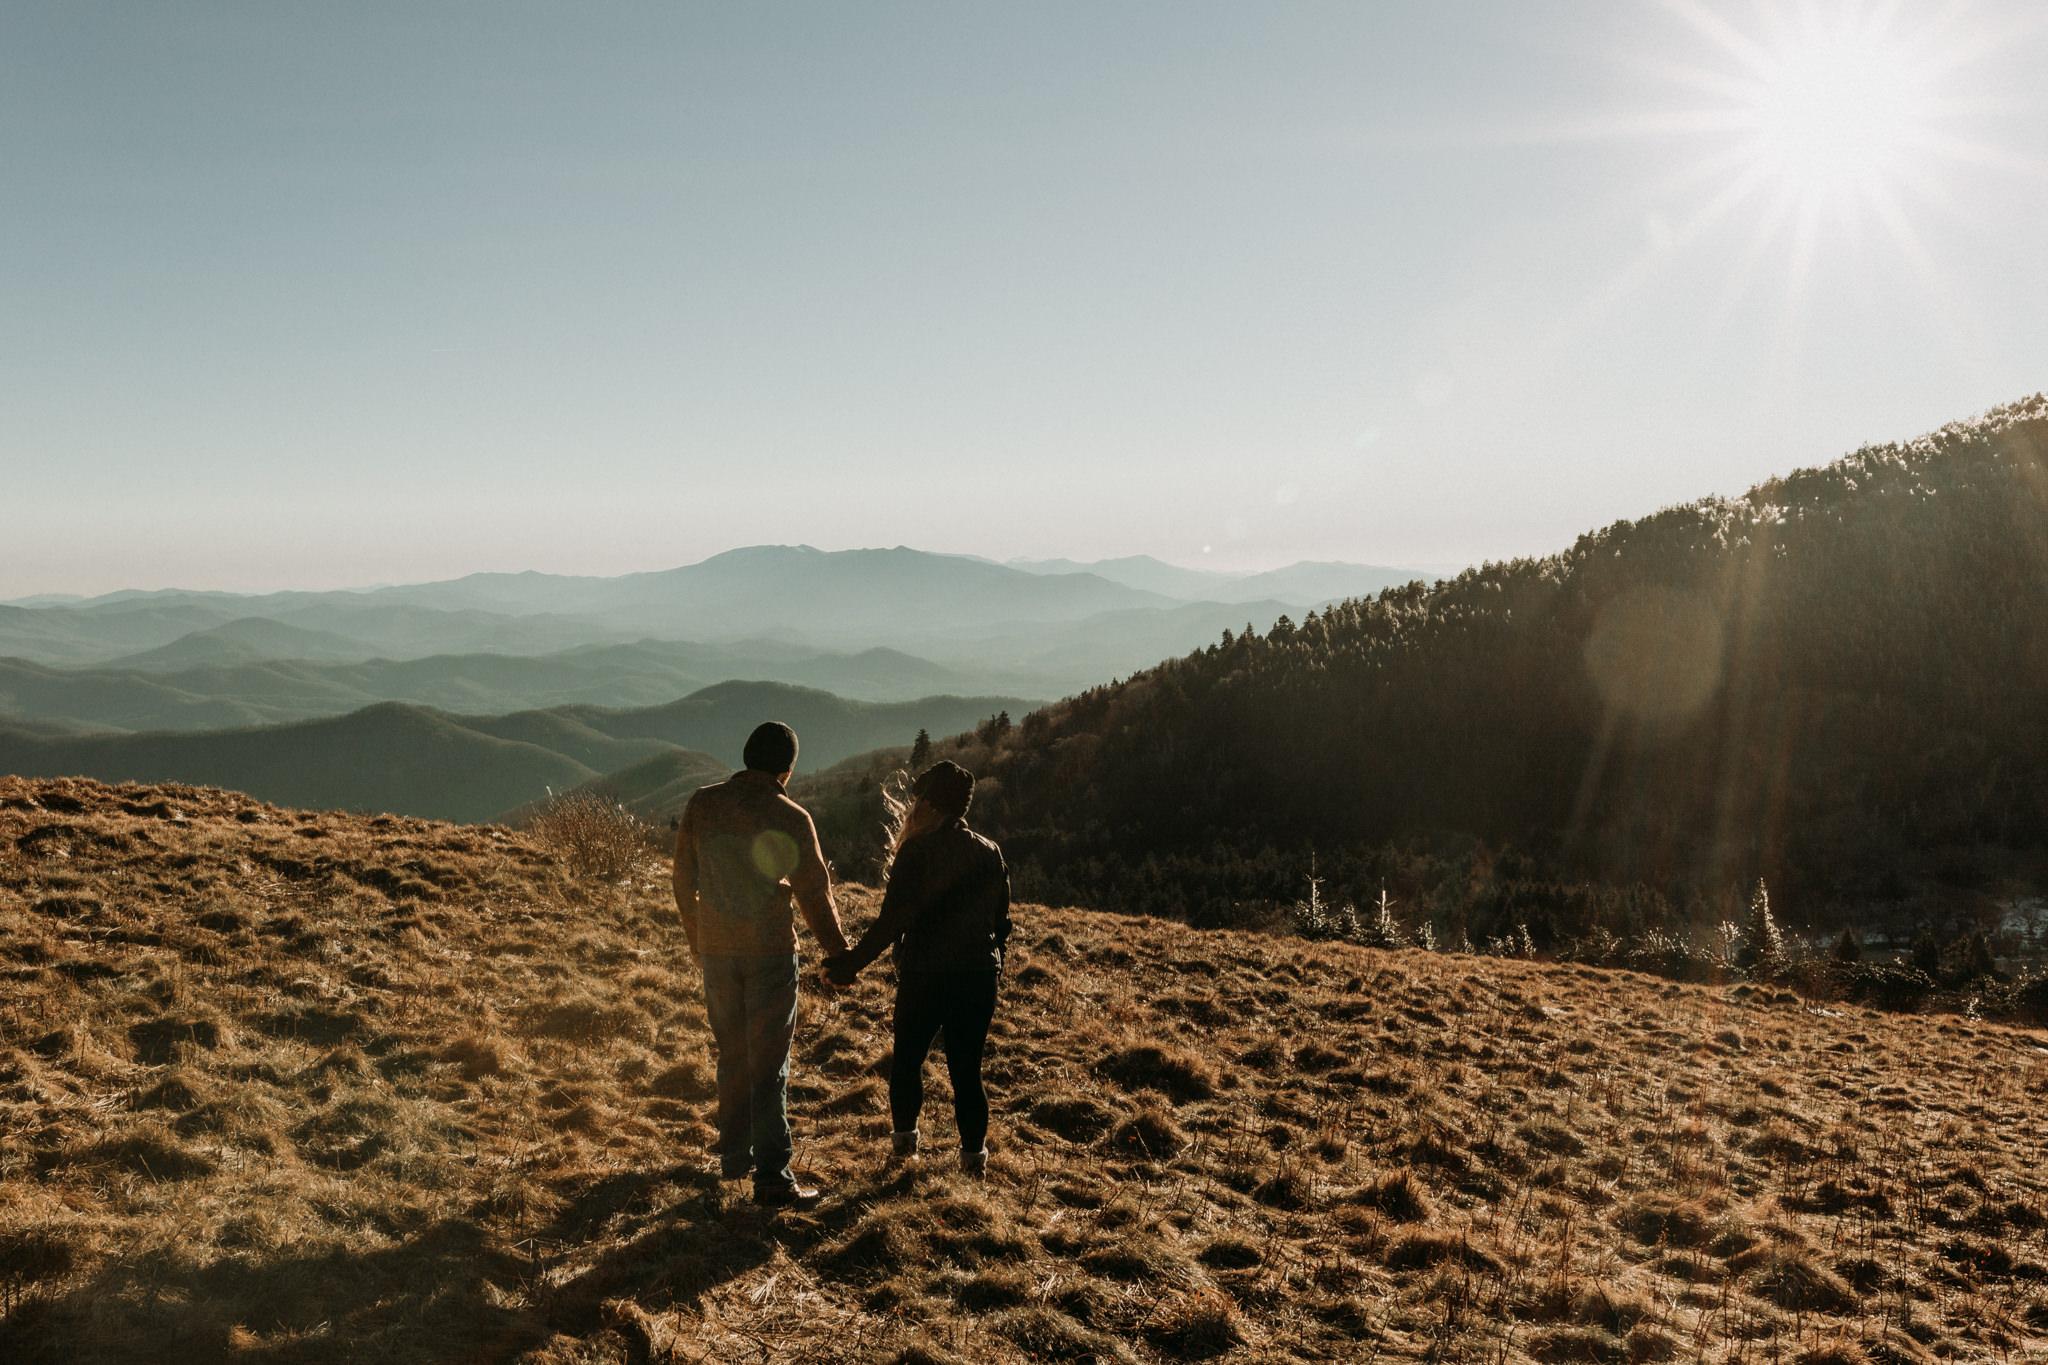 MonicaLeavellPhoto-AshleyMitch-NorthCarolina-Adventure-Engagement-Photographer-22.jpg